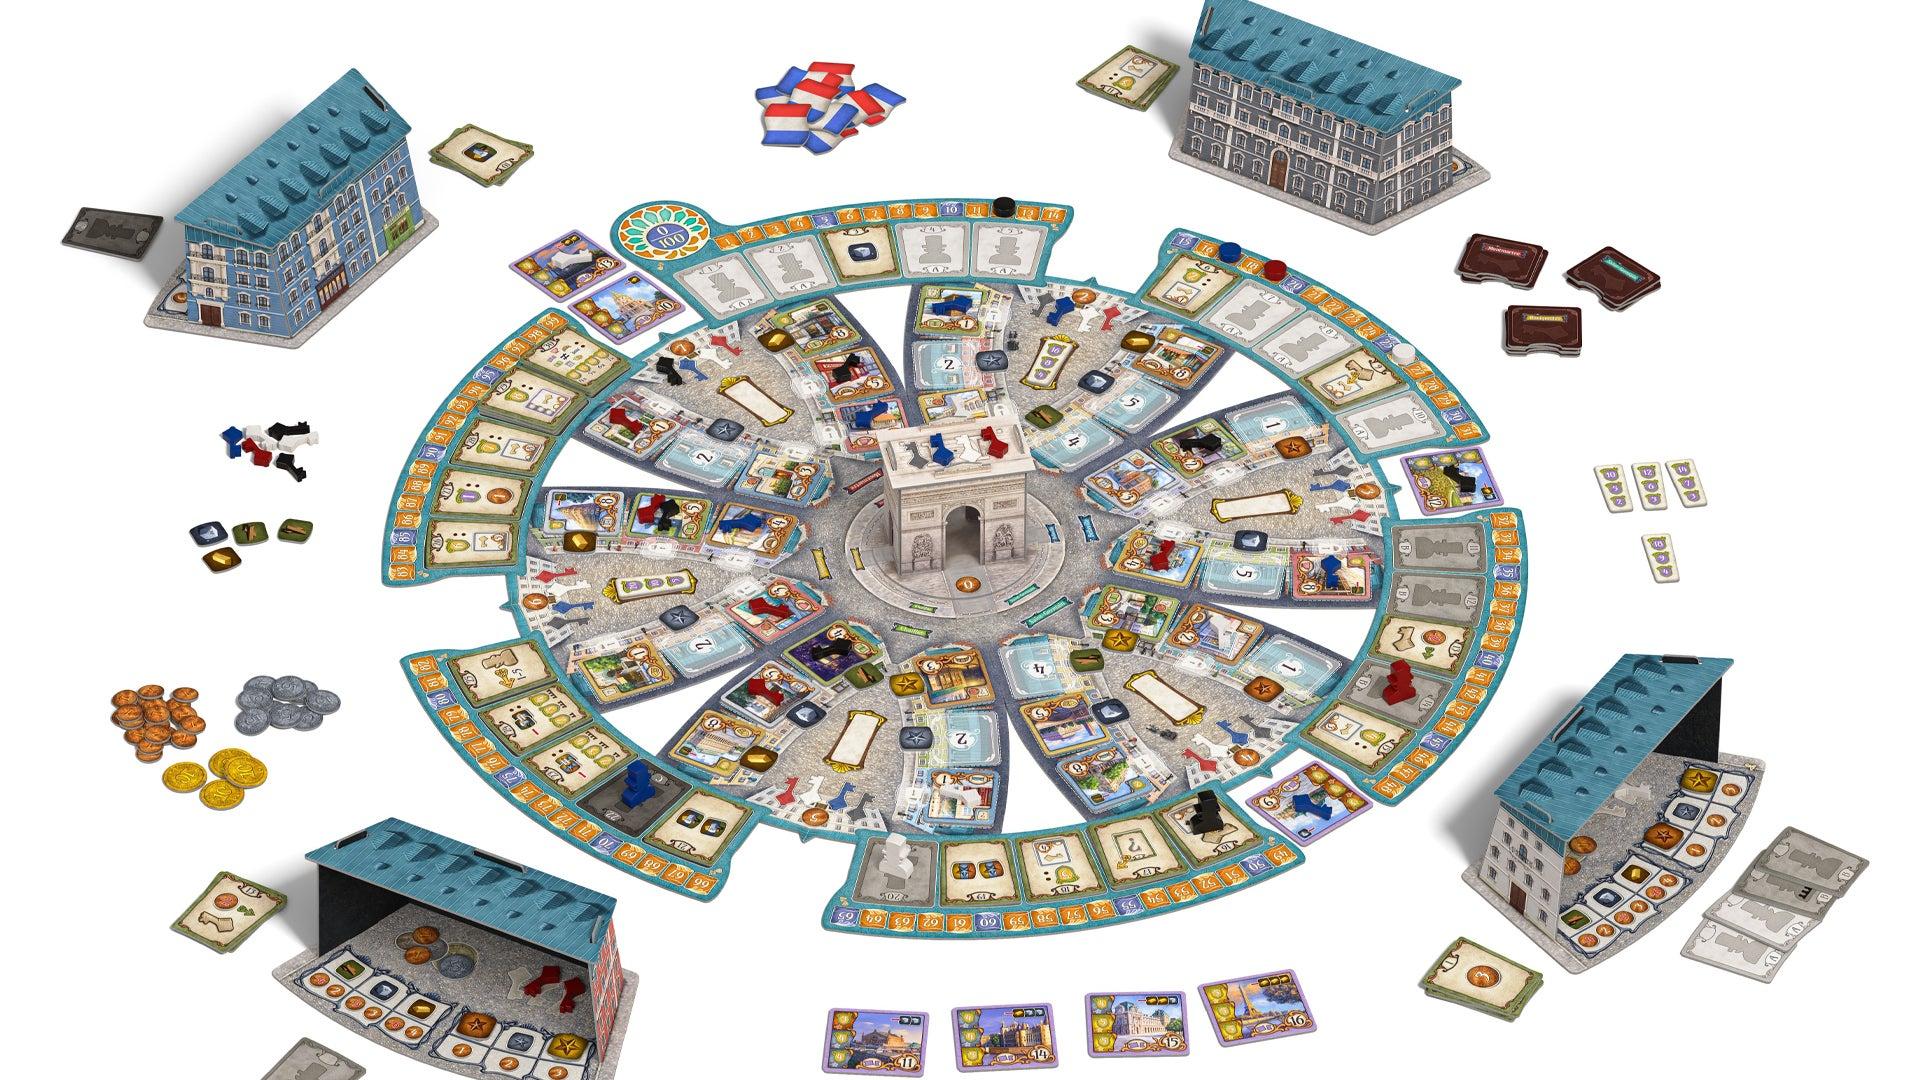 Paris board game layout 2